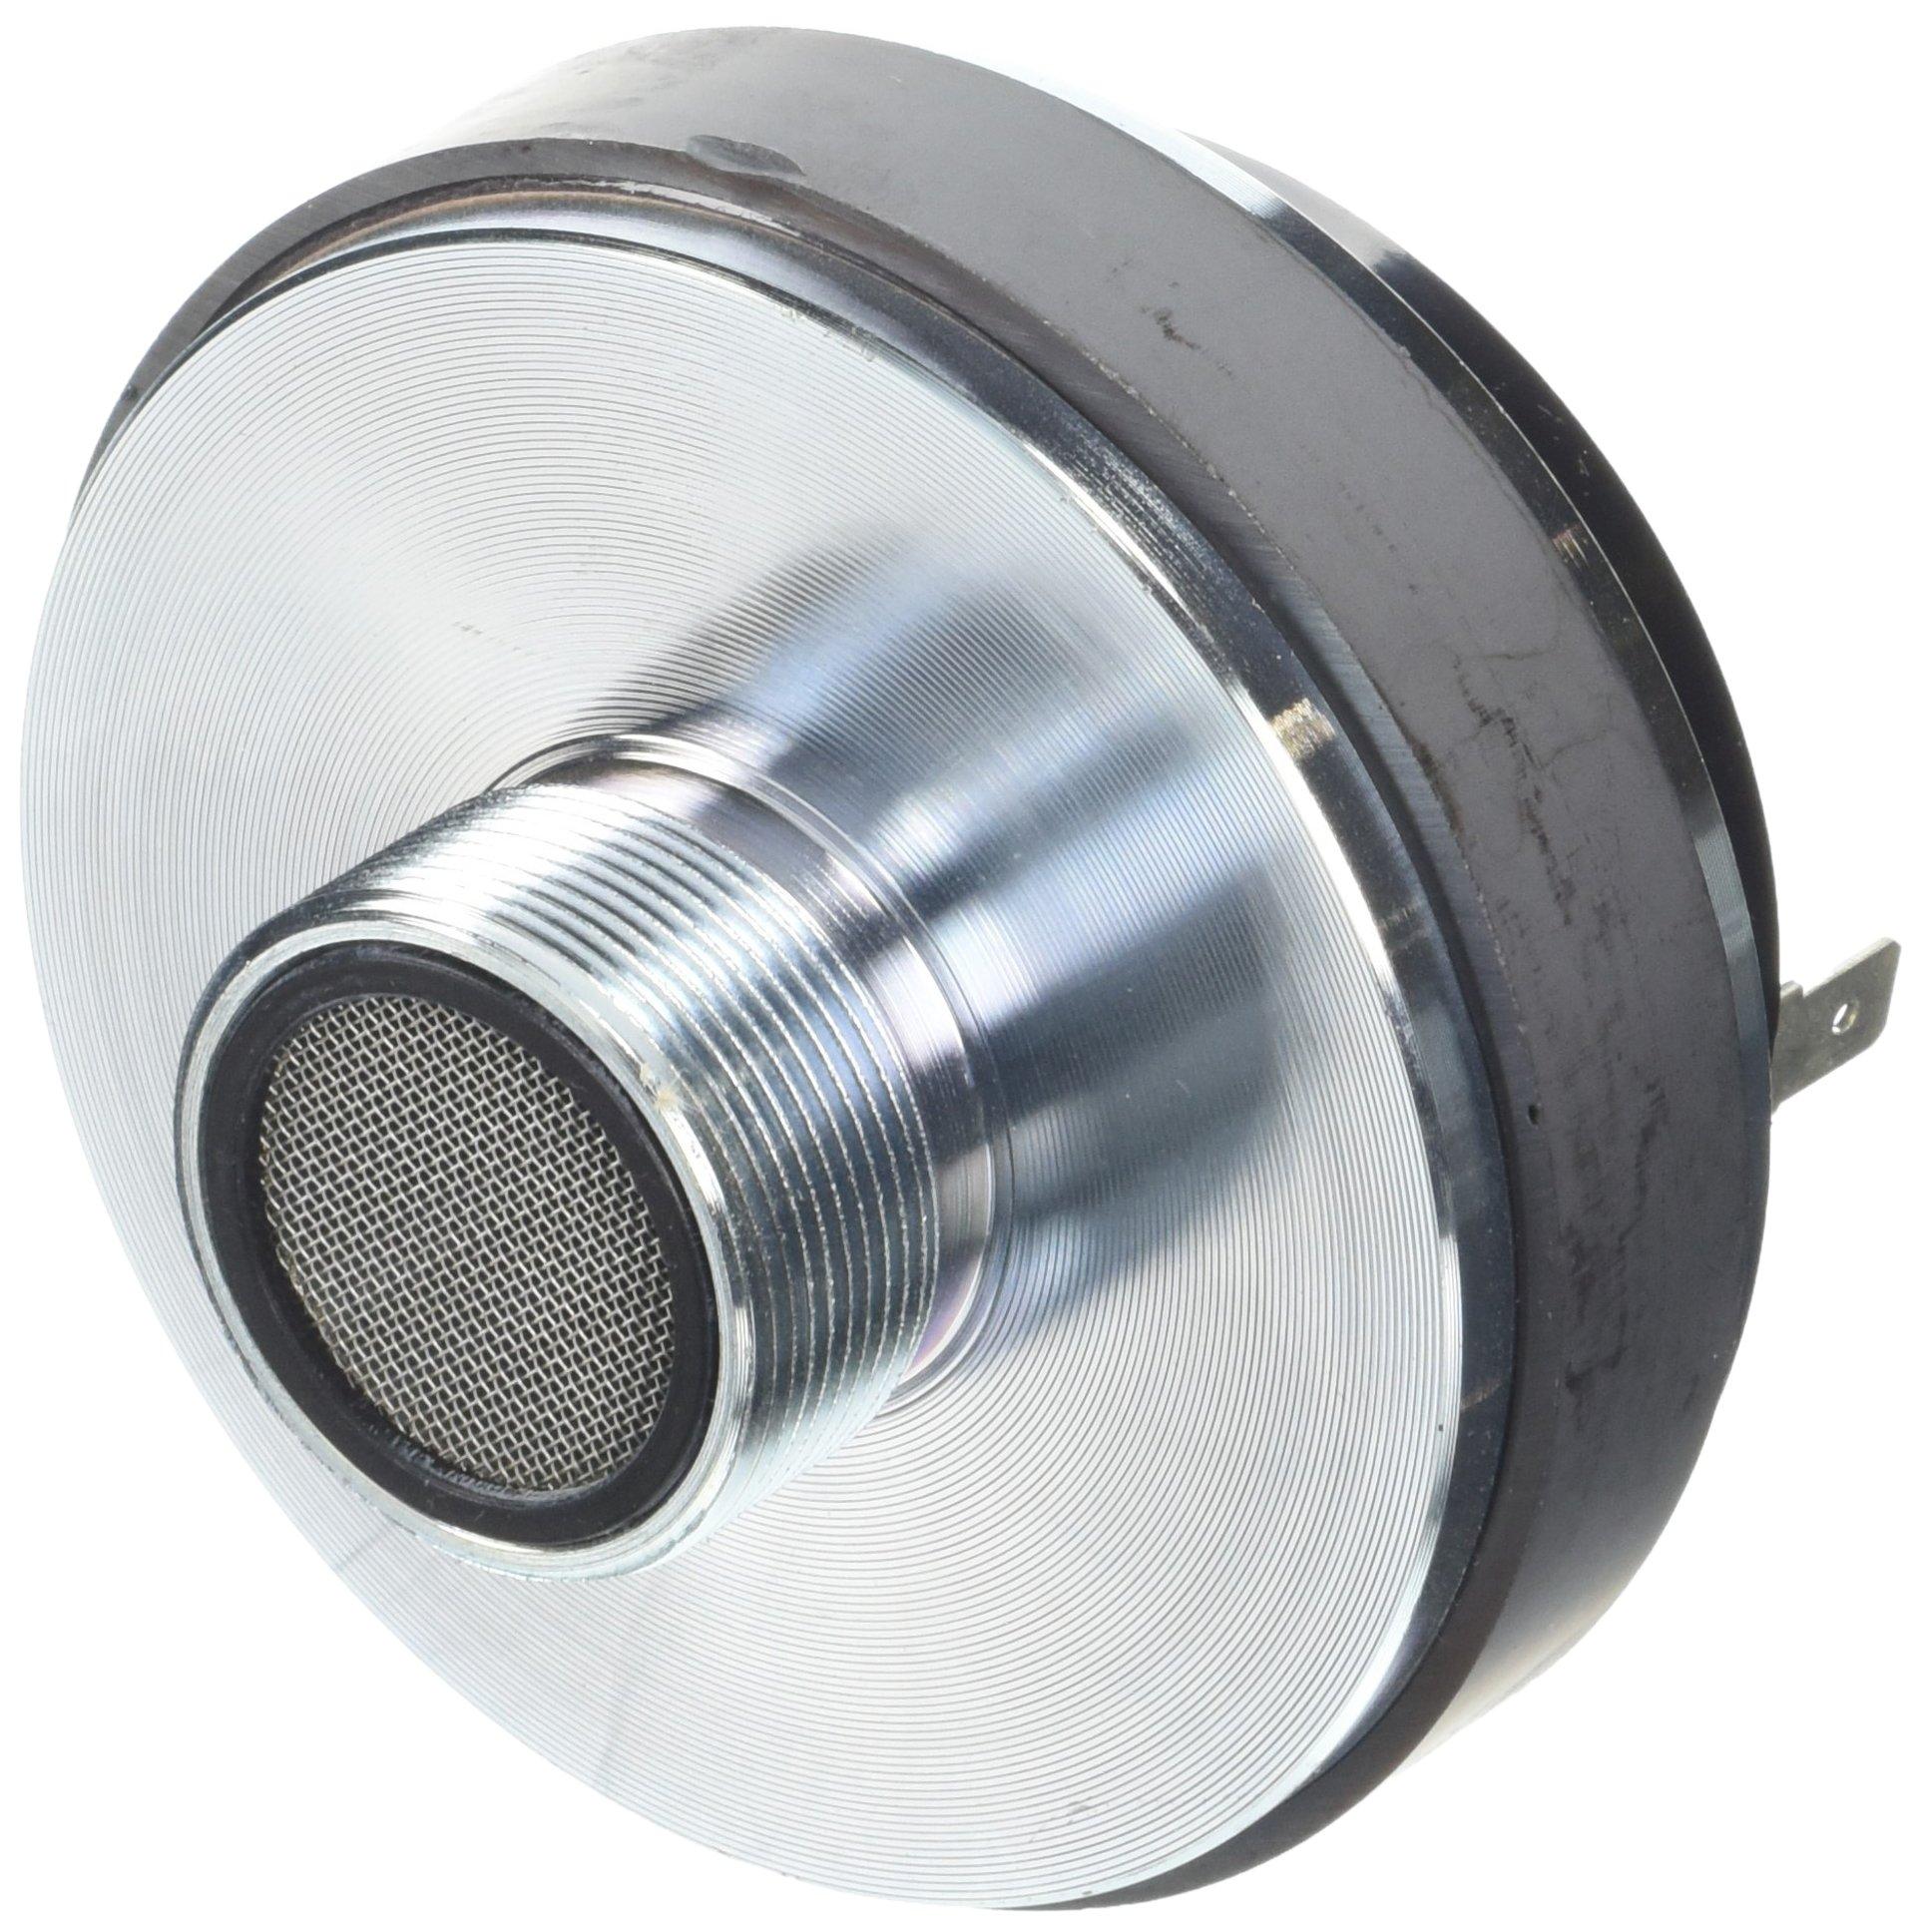 Pyle PDS341 1.35-Inch Titanium Horn Driver 8 Ohm 13/8-Inch x 18 TPI